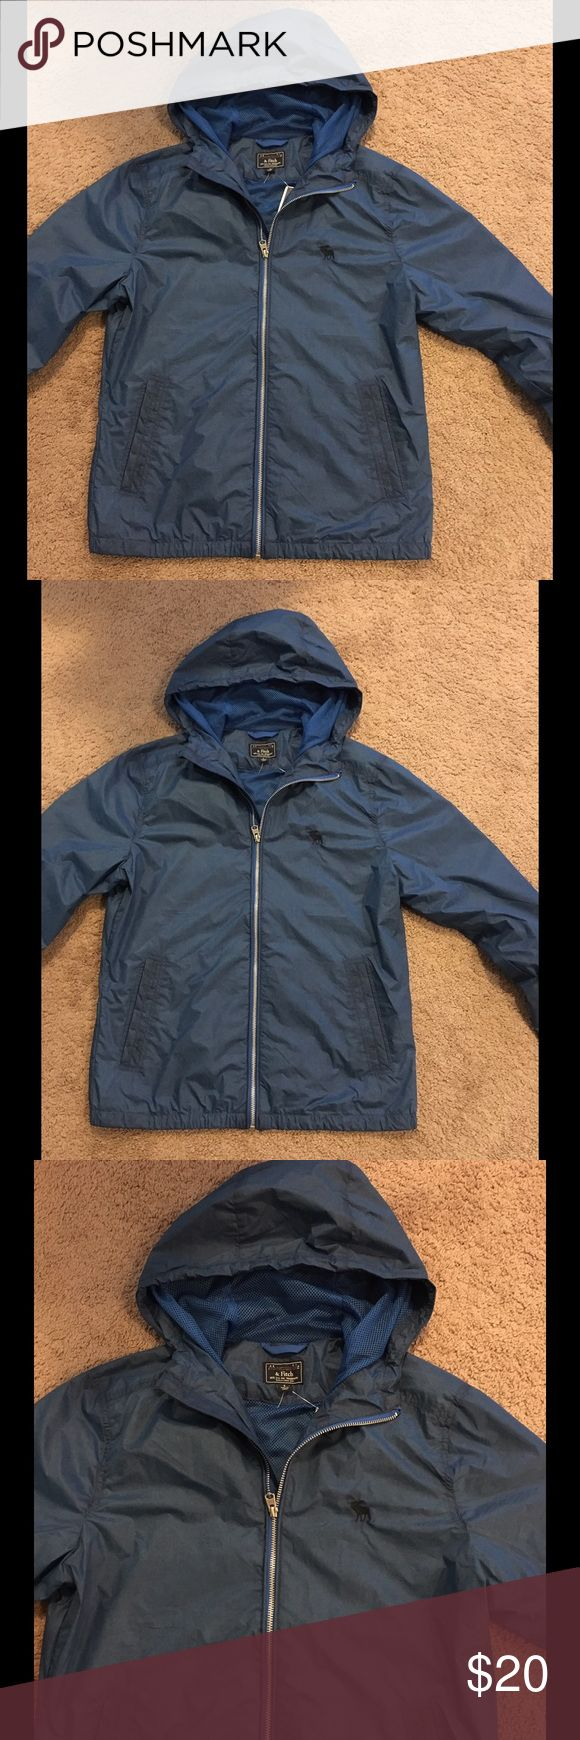 NWOT Abercrombie & Fitch windbreaker NWOT Abercrombie & Fitch windbreaker in beautiful blue color with full zipper & hood. Very lightweight! Abercrombie & Fitch Jackets & Coats